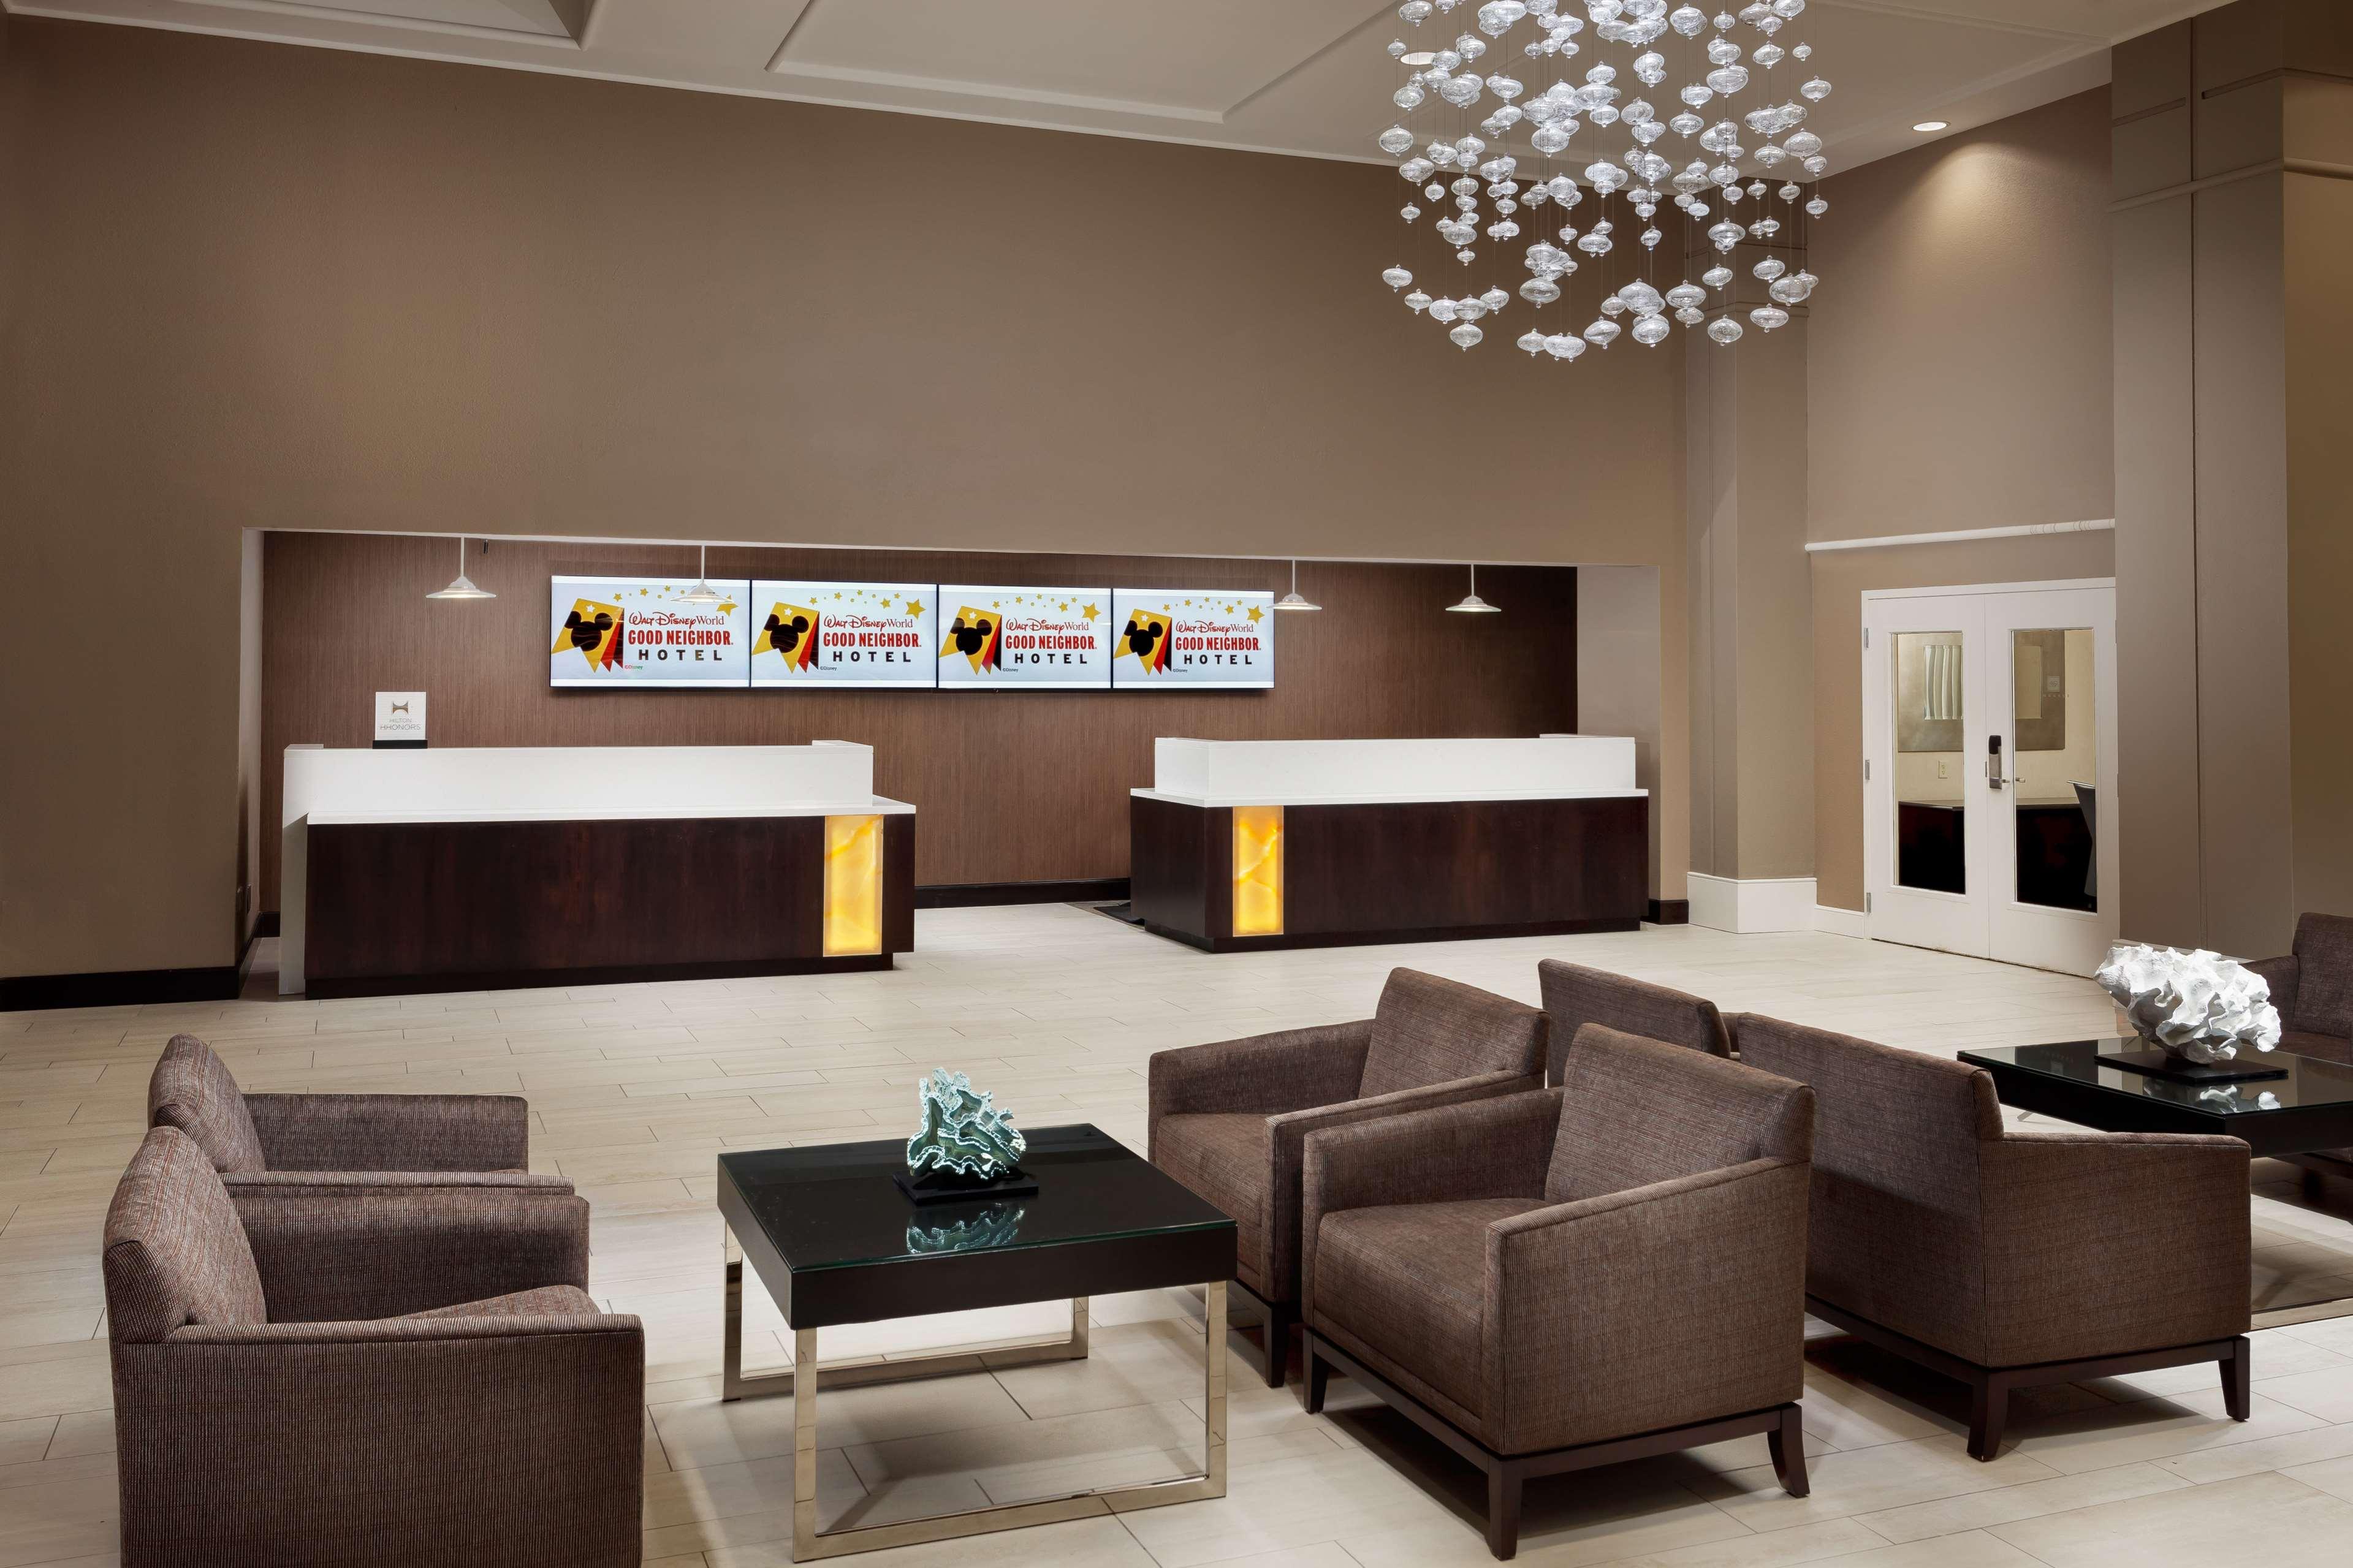 Embassy Suites by Hilton Orlando Lake Buena Vista Resort image 3